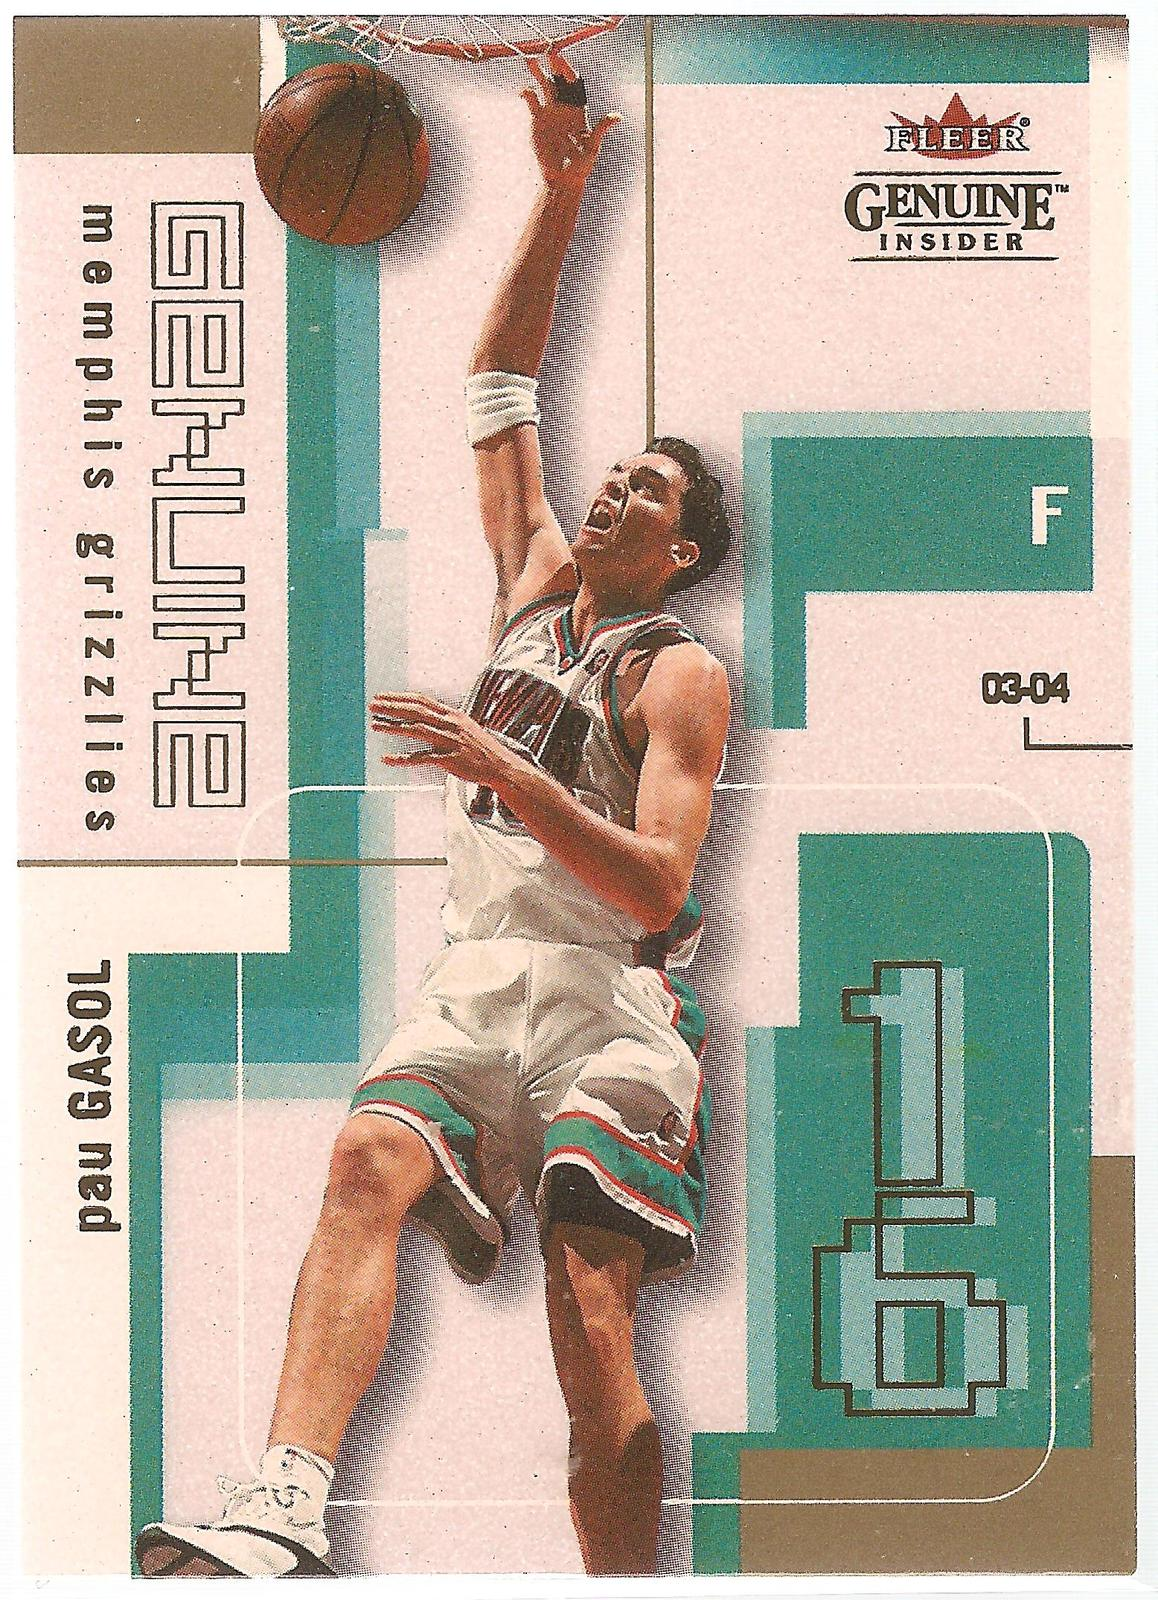 Pau Gasol Fleer Genuine Insider 03-04 #16 Memphis Grizzlies Chicago Bulls Lakers